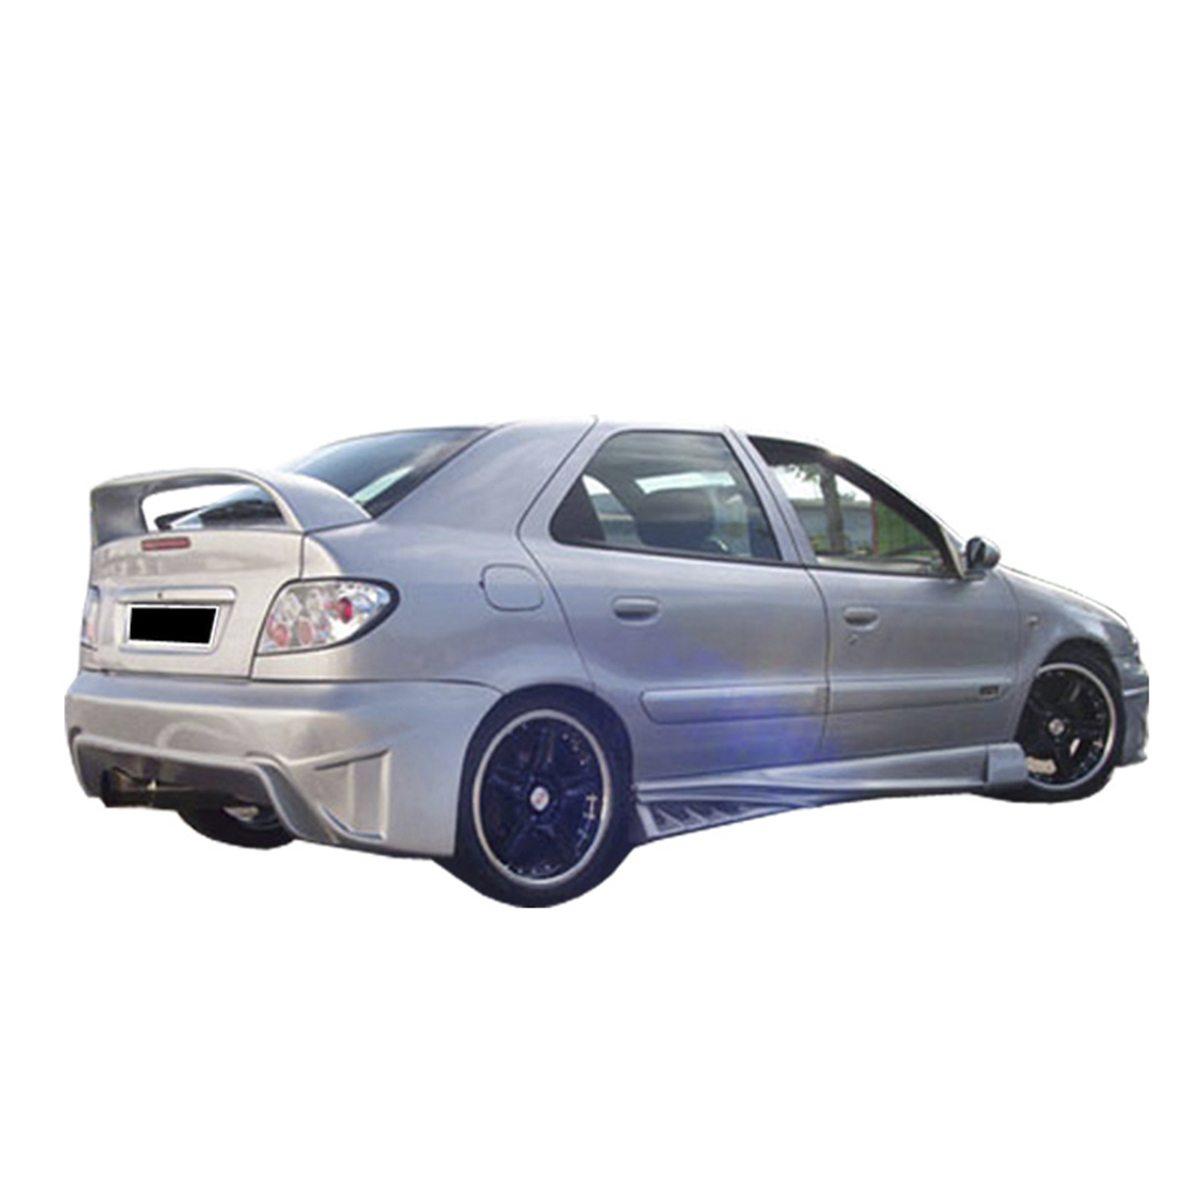 Citroen-Xsara-FOX-Tras-PCC002